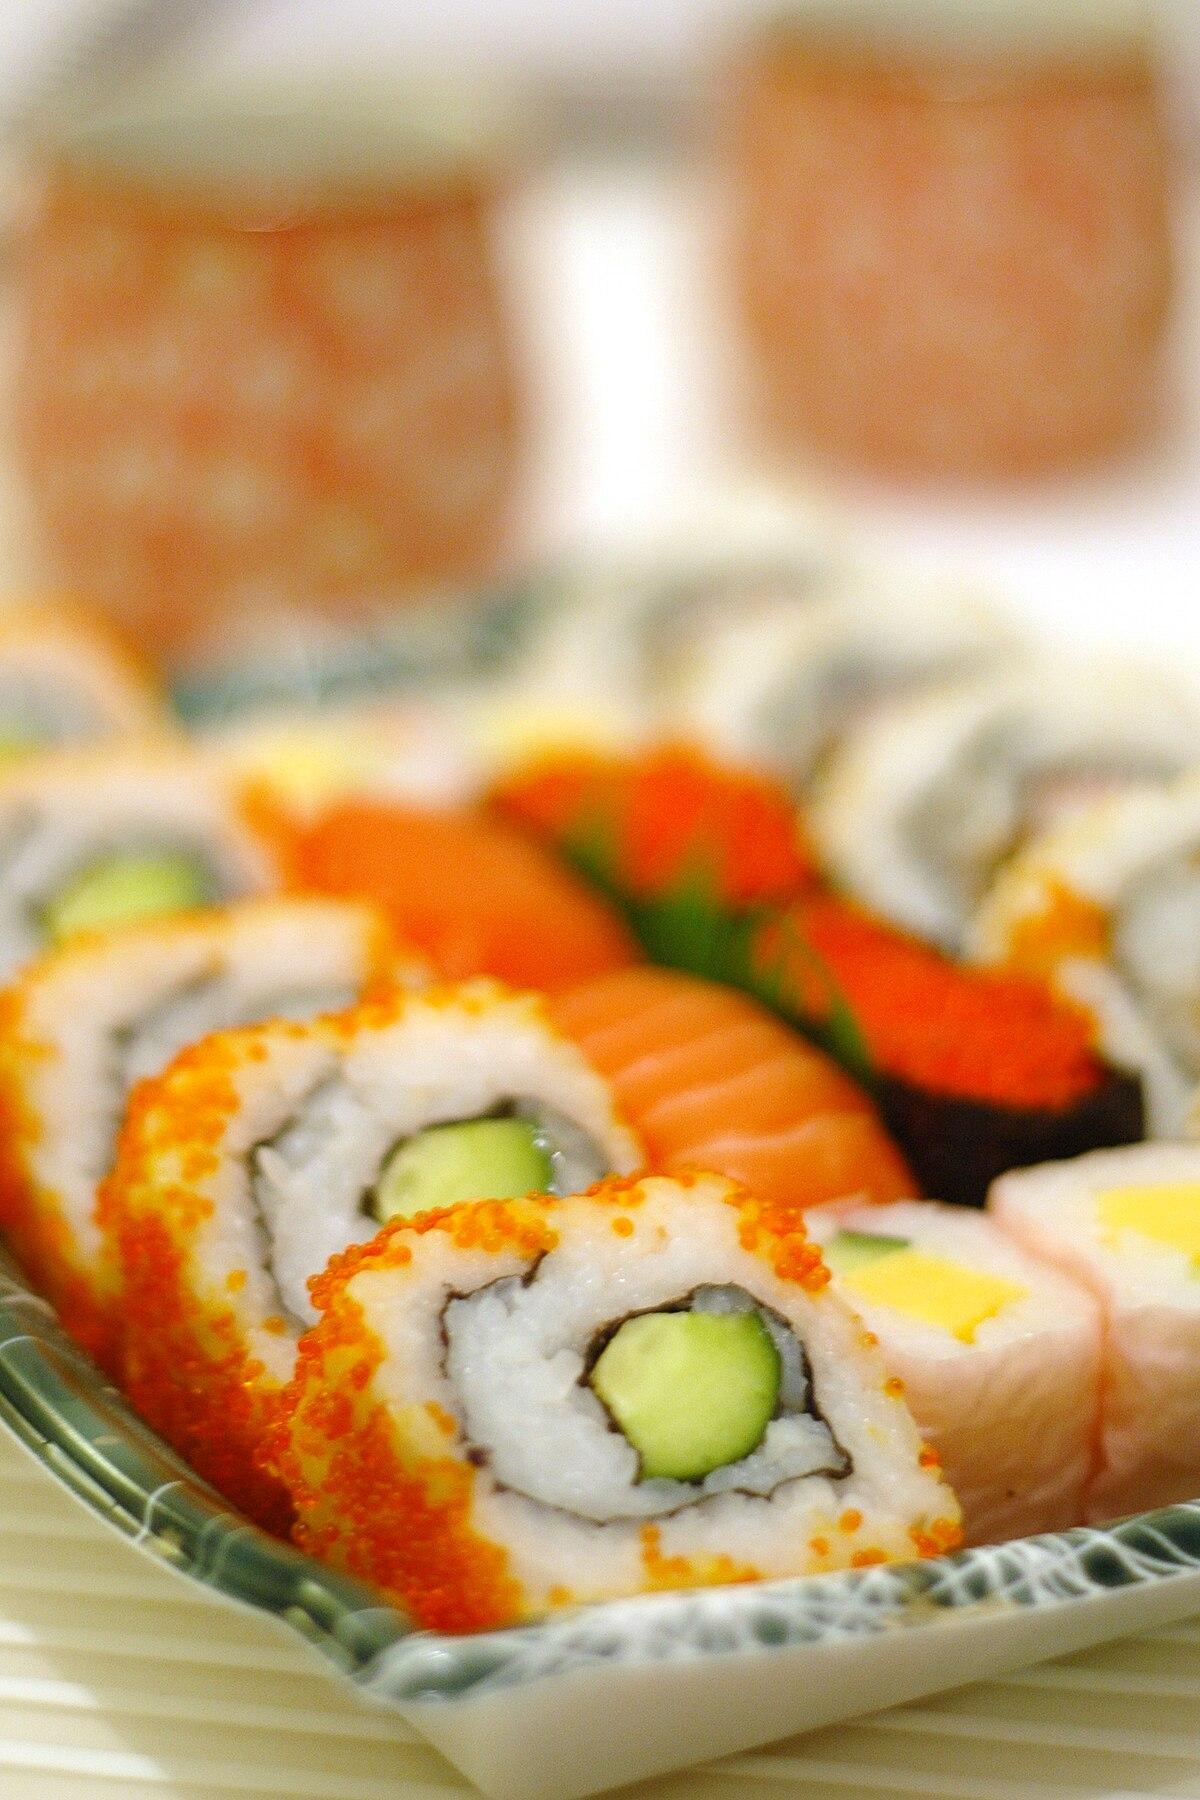 Sushi Wikipedia Den Frie Encyklop 230 Di